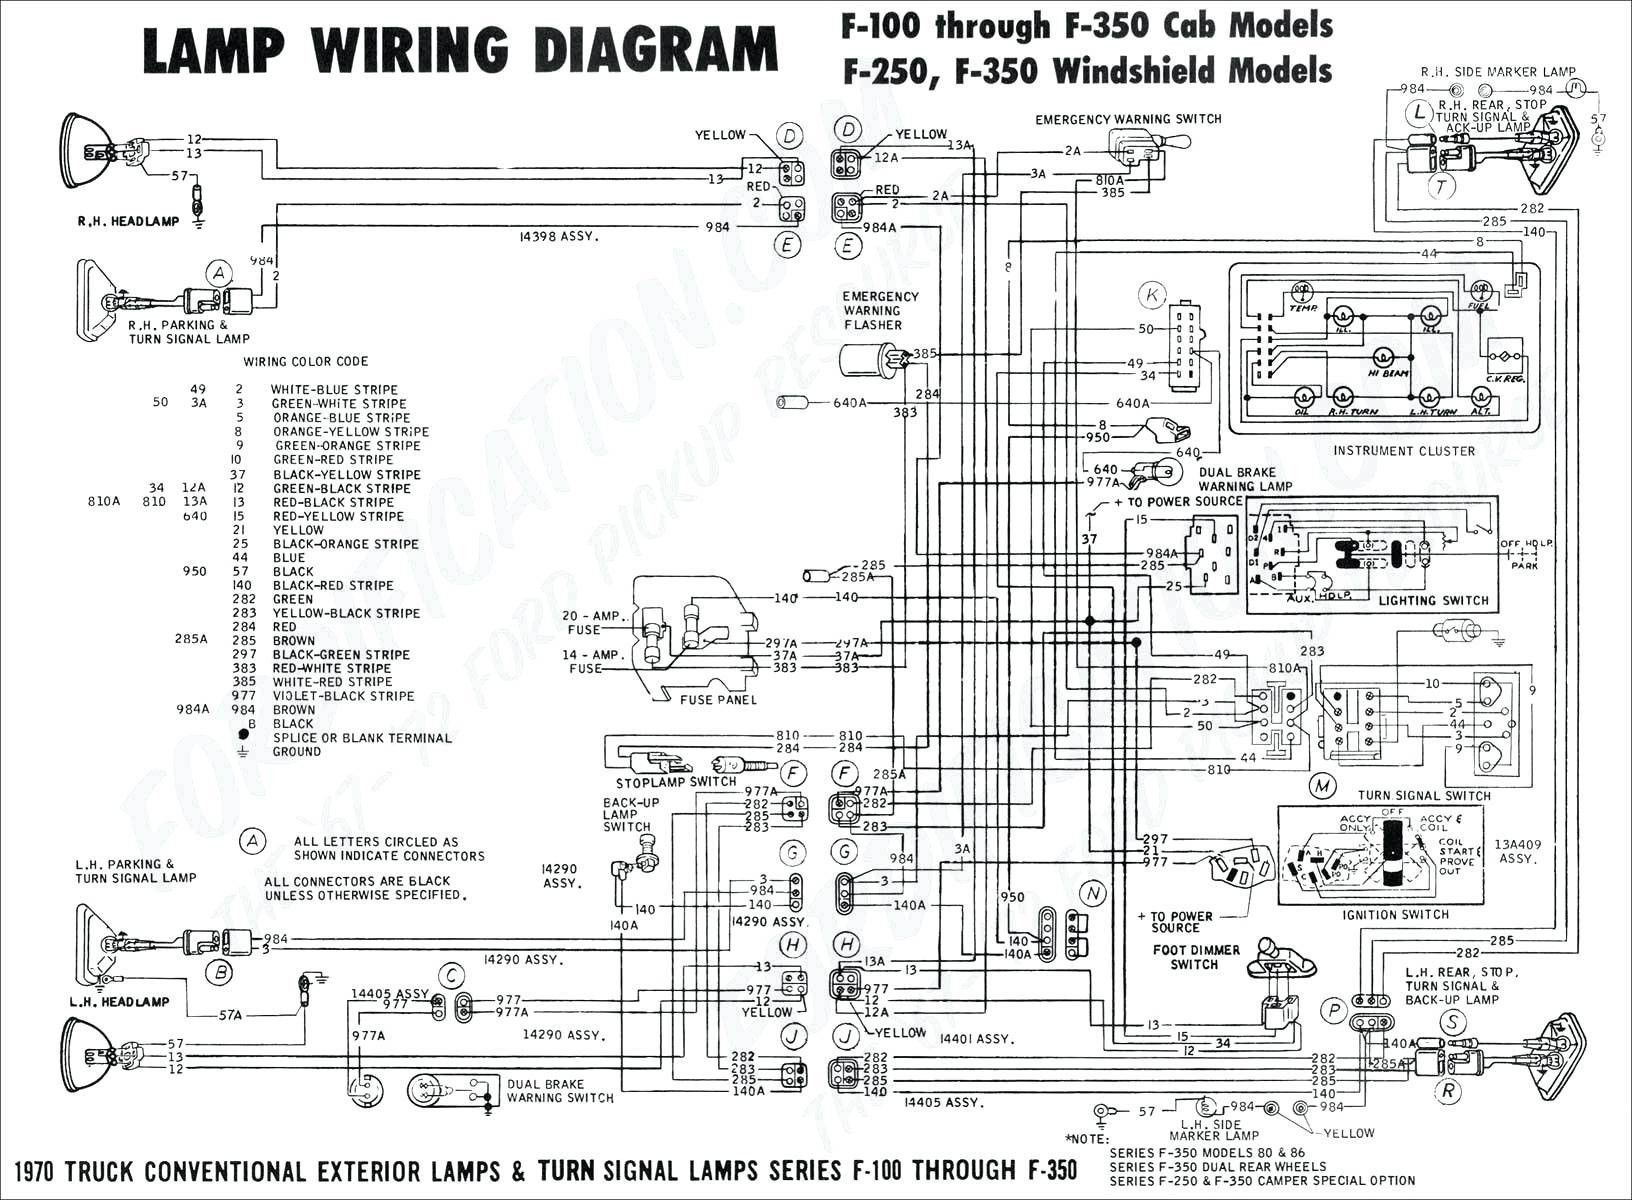 [DIAGRAM] 1998 Subaru Impreza Wiring Diagram Lights